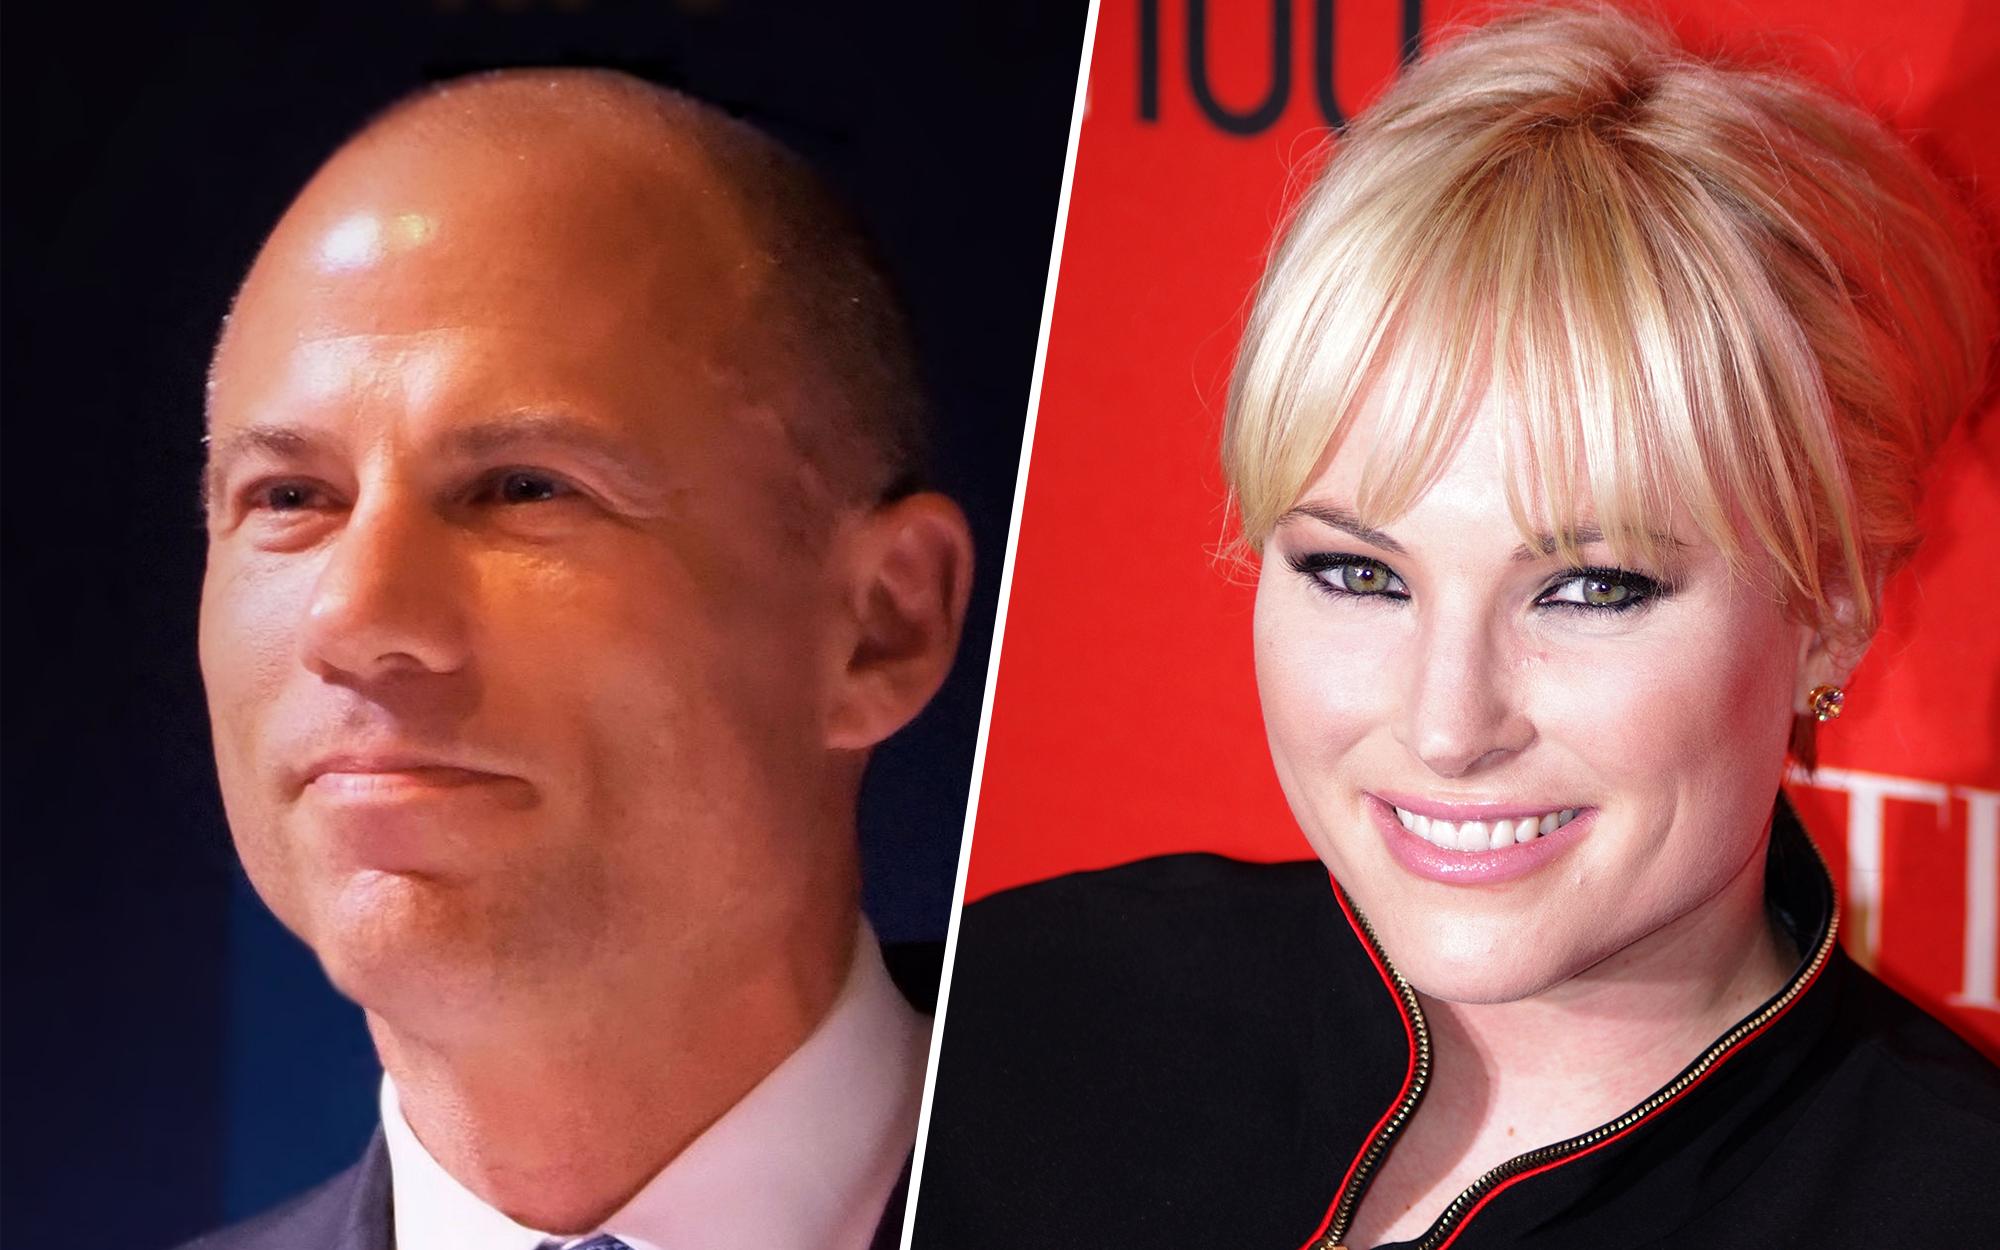 Meghan McCain looks nauseated when Avenatti says 'all of my sexual fantasies involve handcuffs'